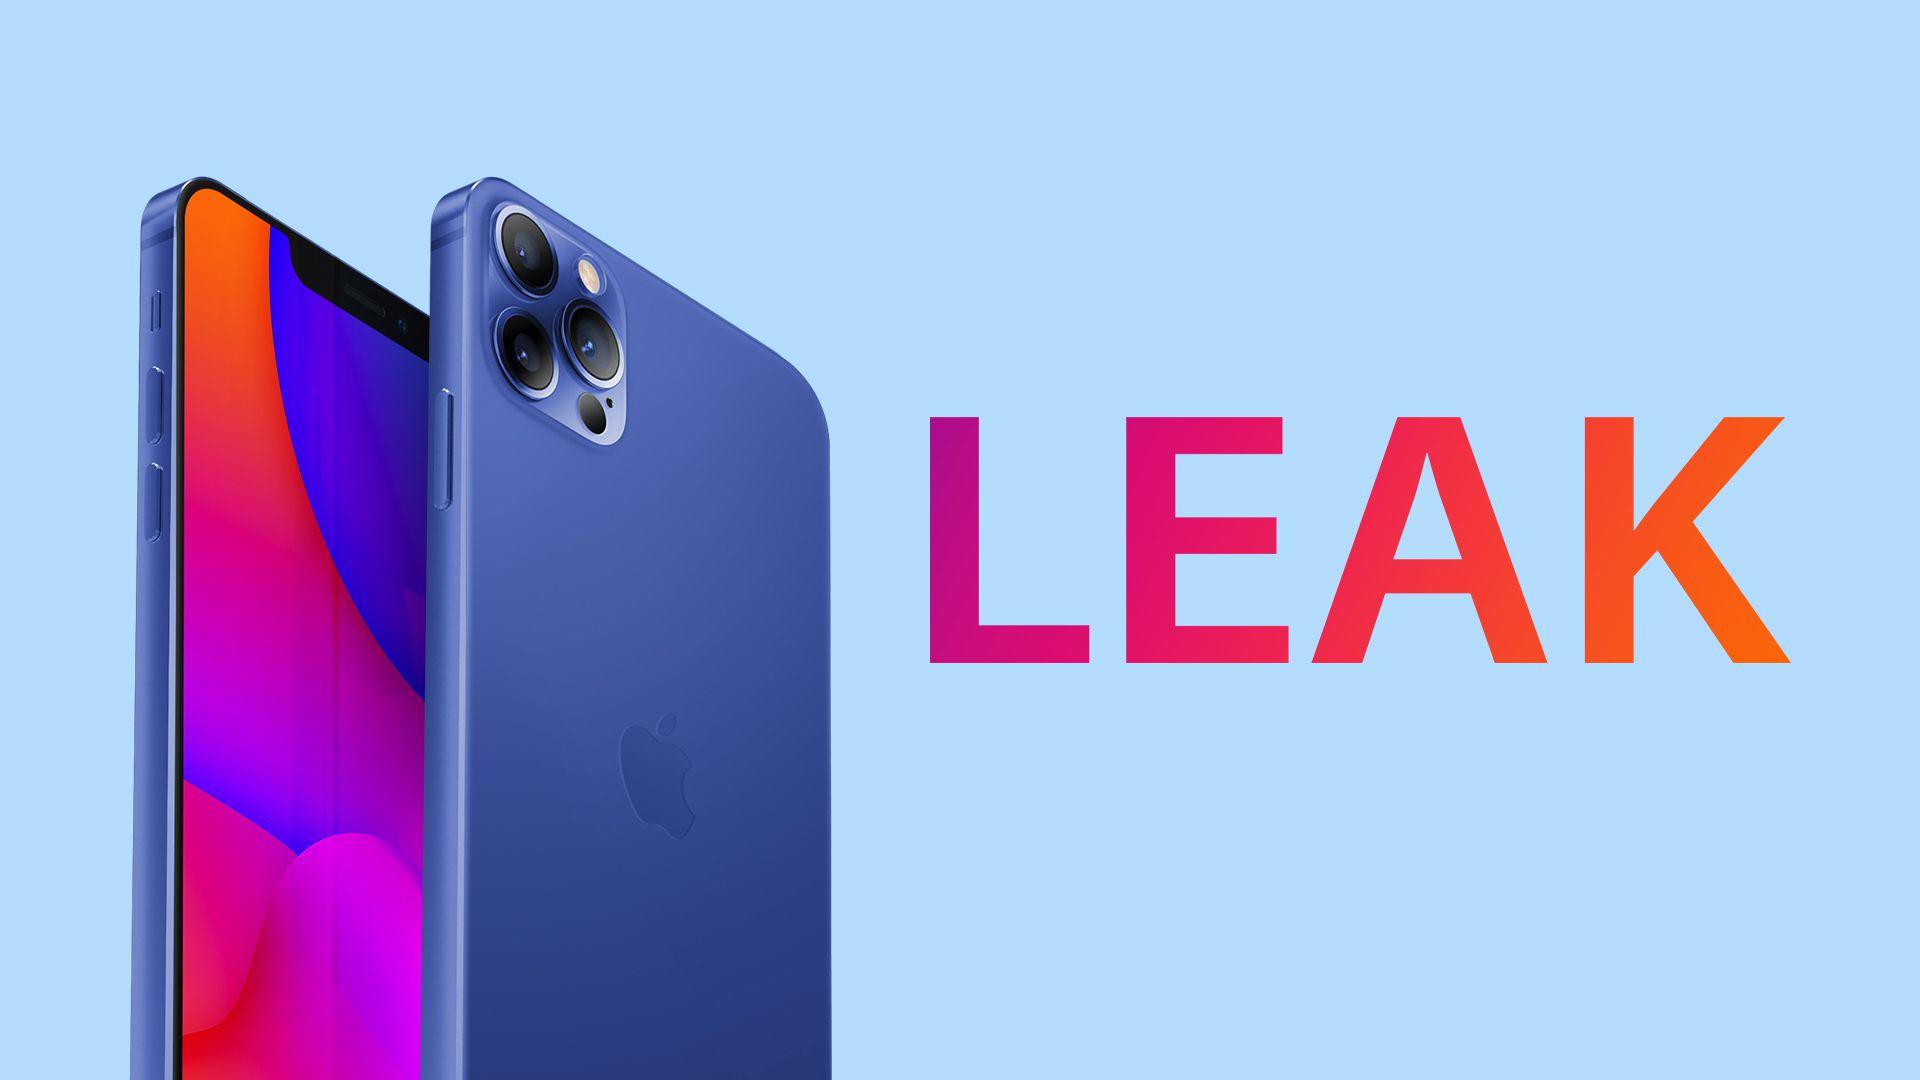 Full Details Of Iphone 12 Lineup Allegedly Leaked Ahead Of Next Week S Apple Event Macrumors